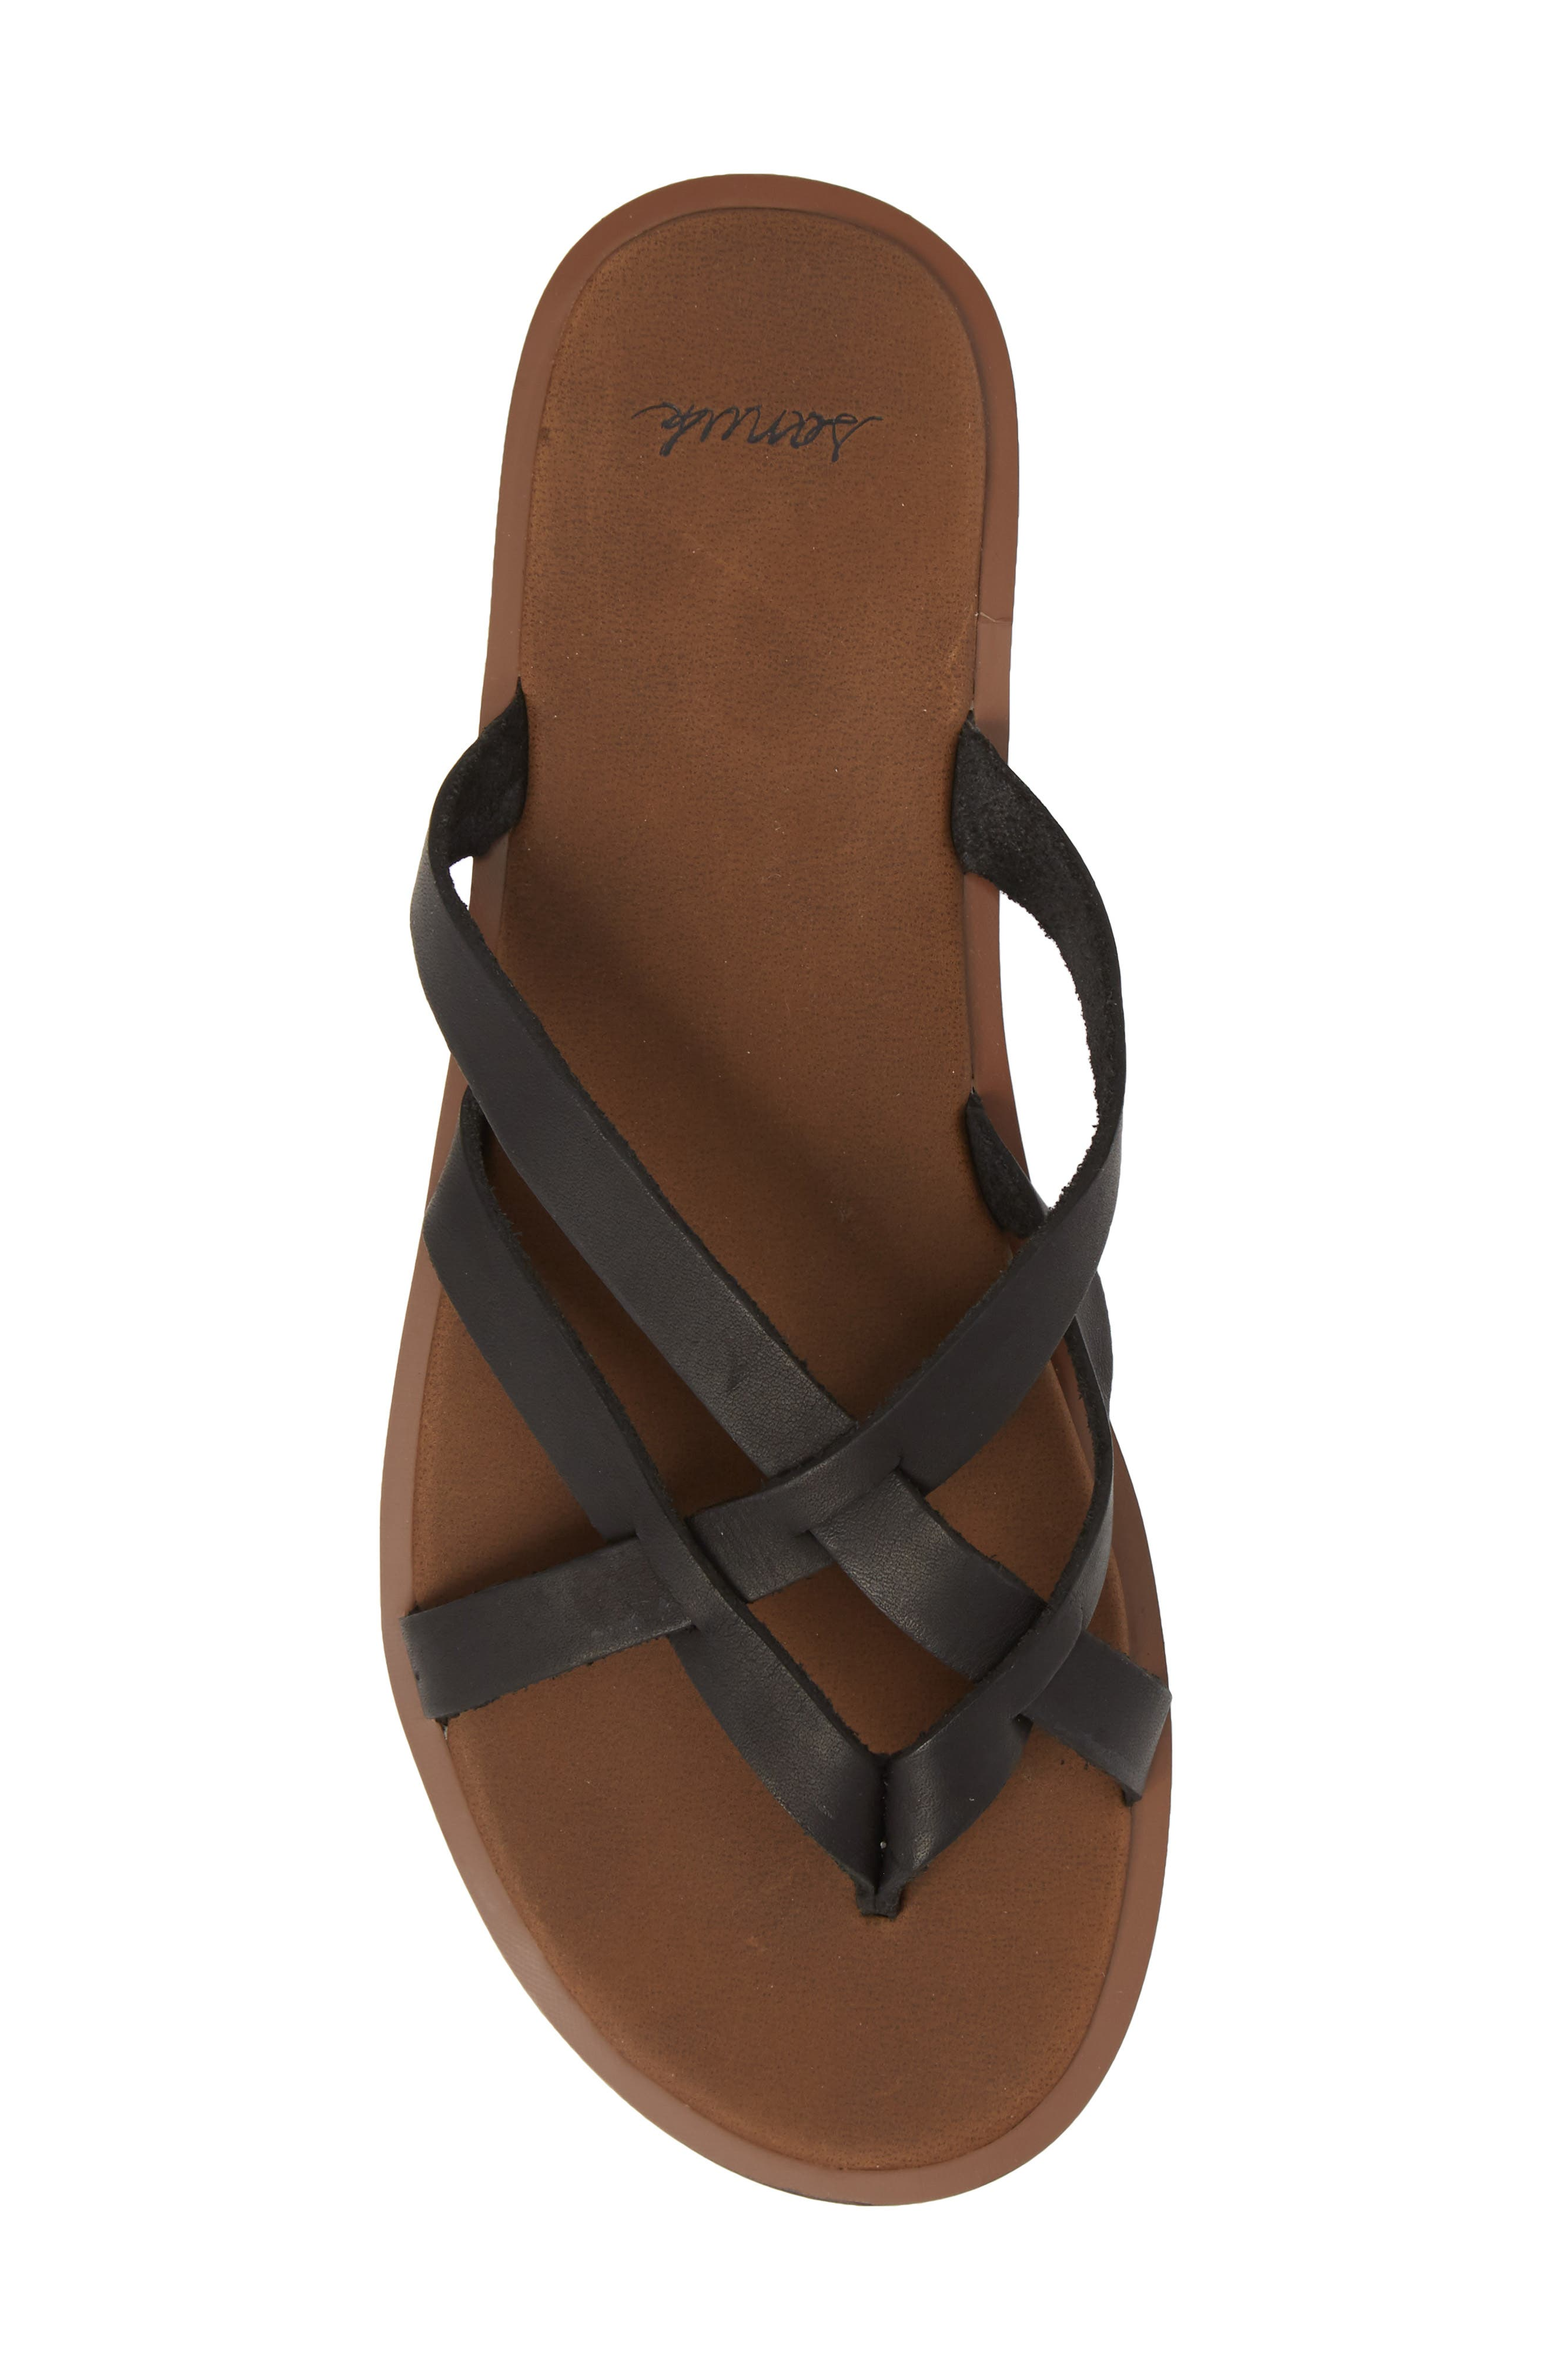 Yoga Strappy Thong Sandal,                             Alternate thumbnail 5, color,                             001